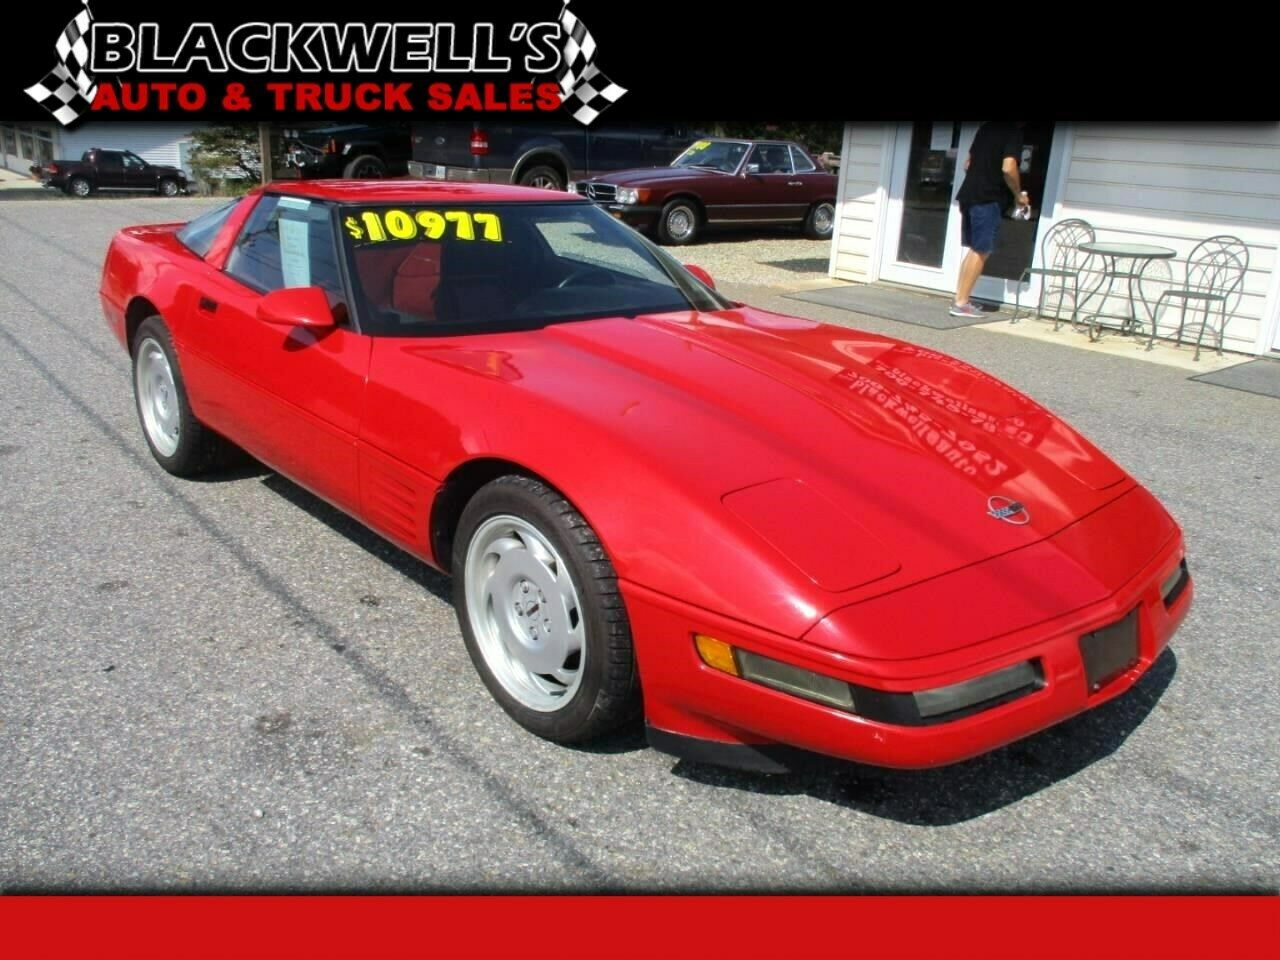 1991 Chevrolet Corvette 2dr Coupe Hatchback